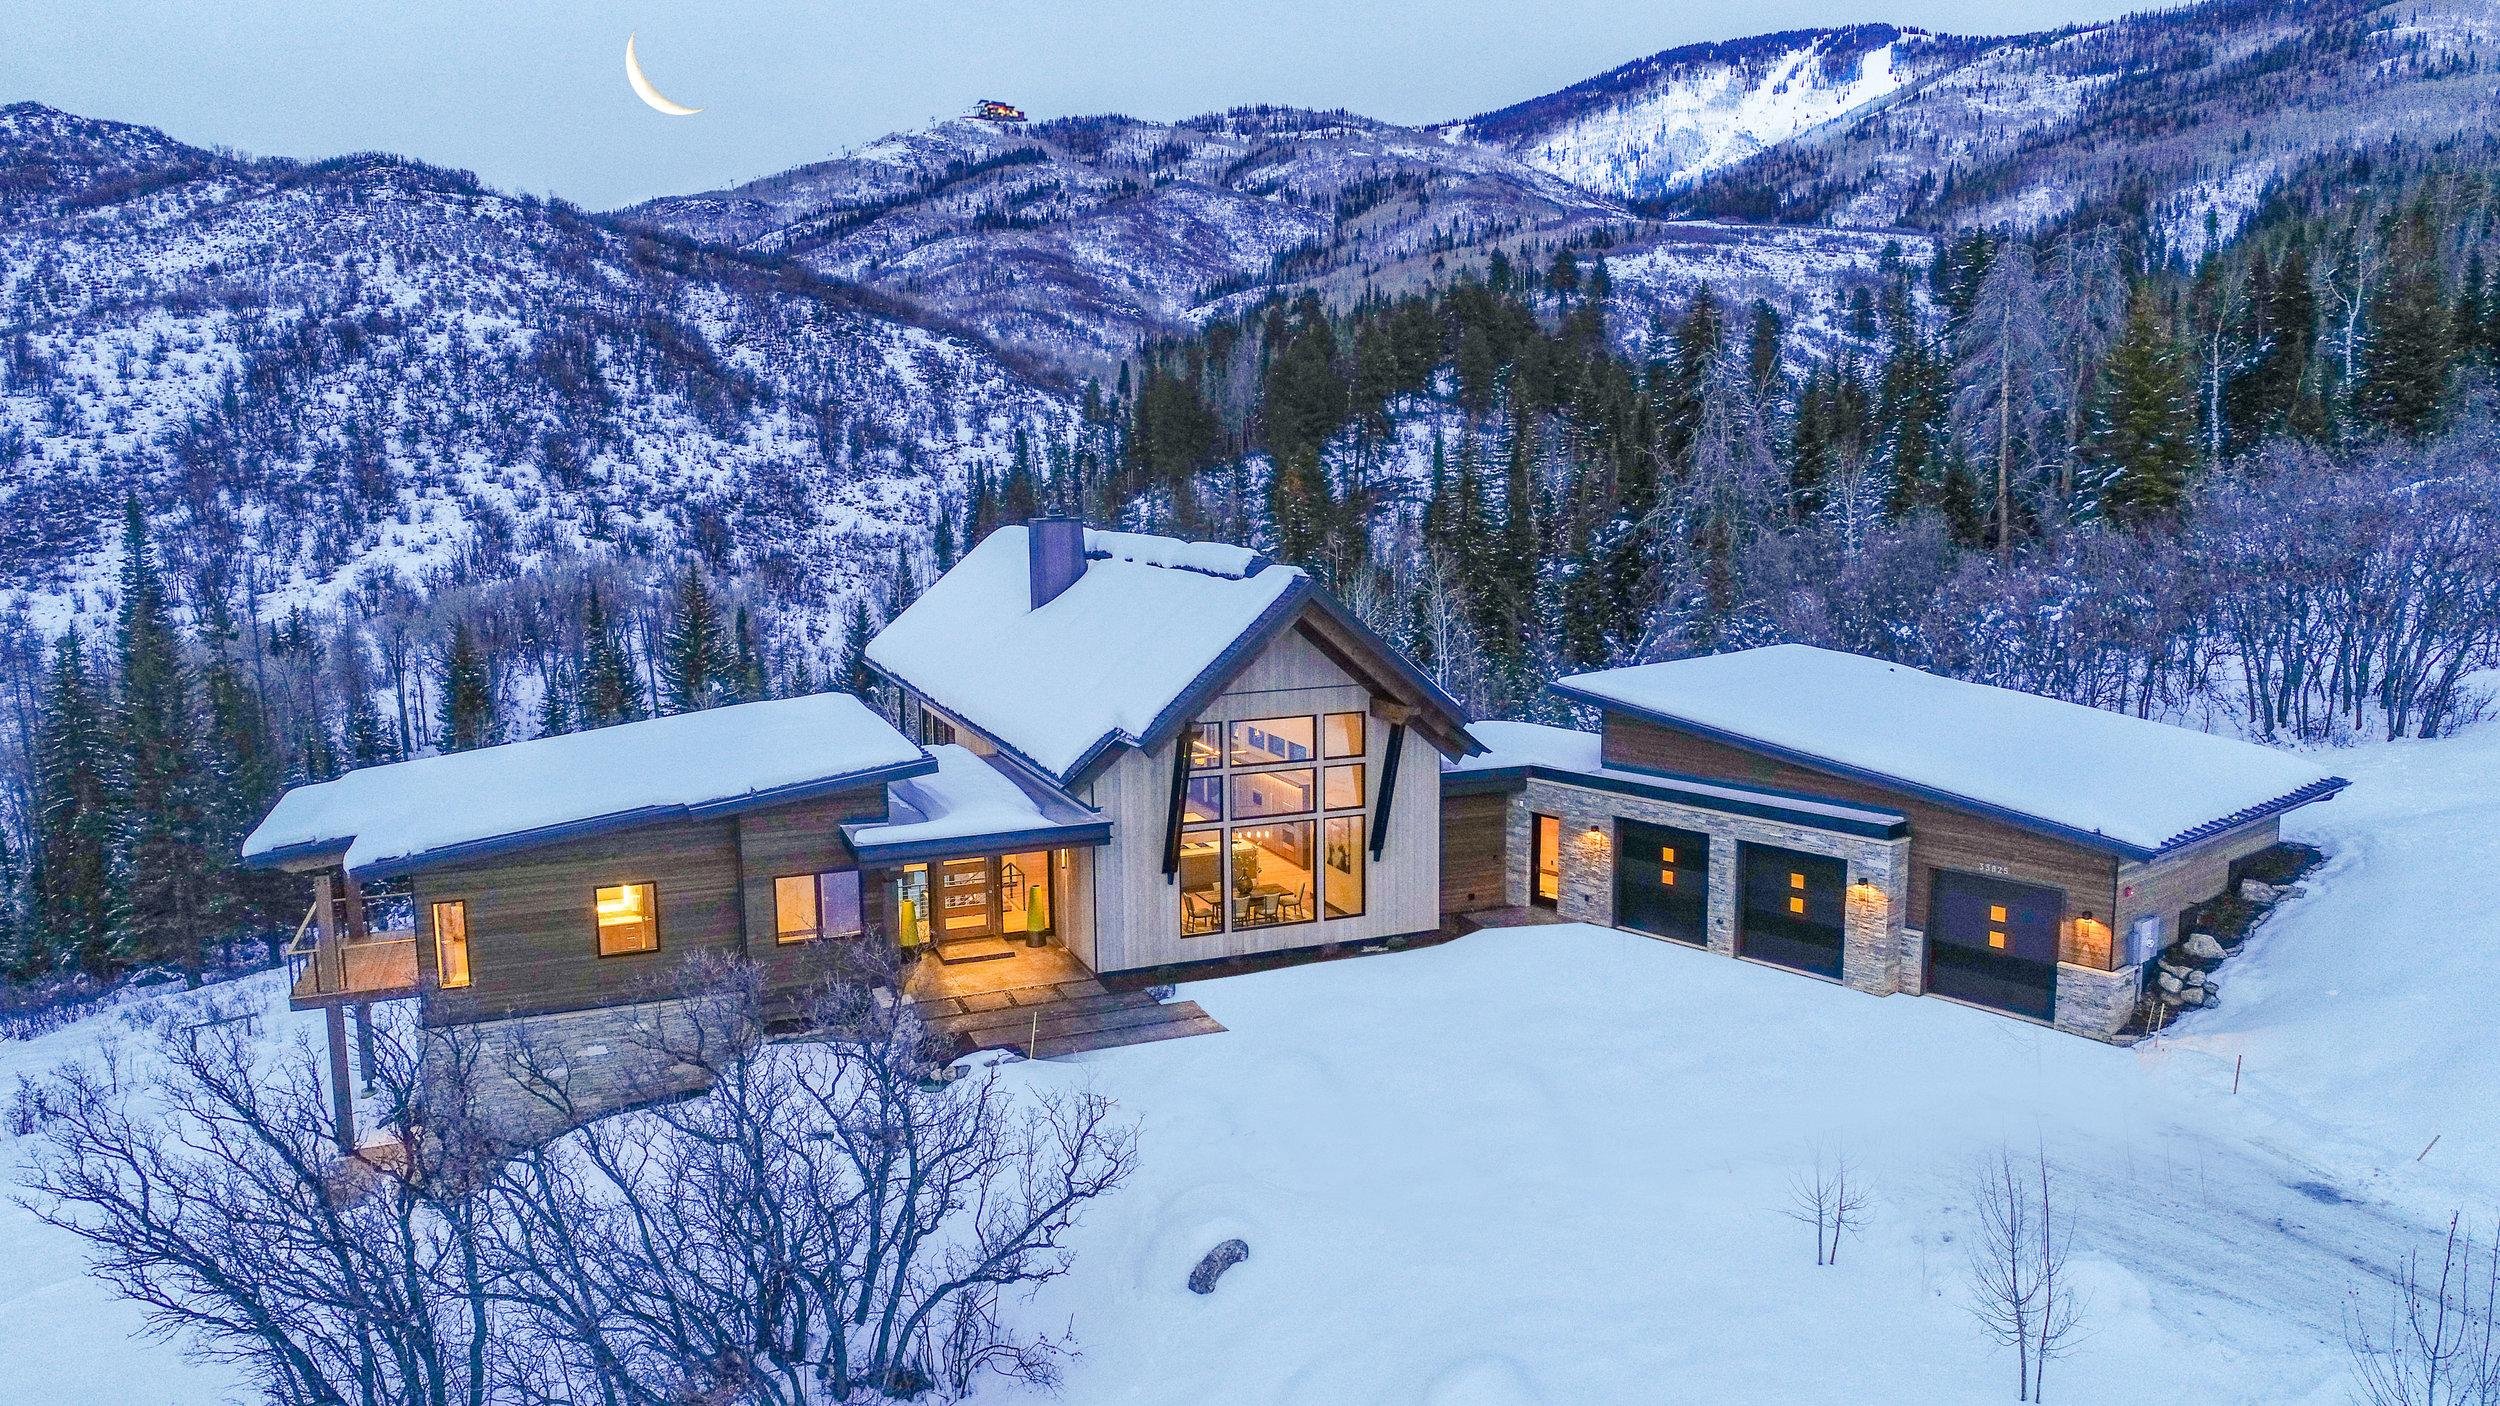 Alpine Mountain Ranch Property - Twilight Drone-30.jpg